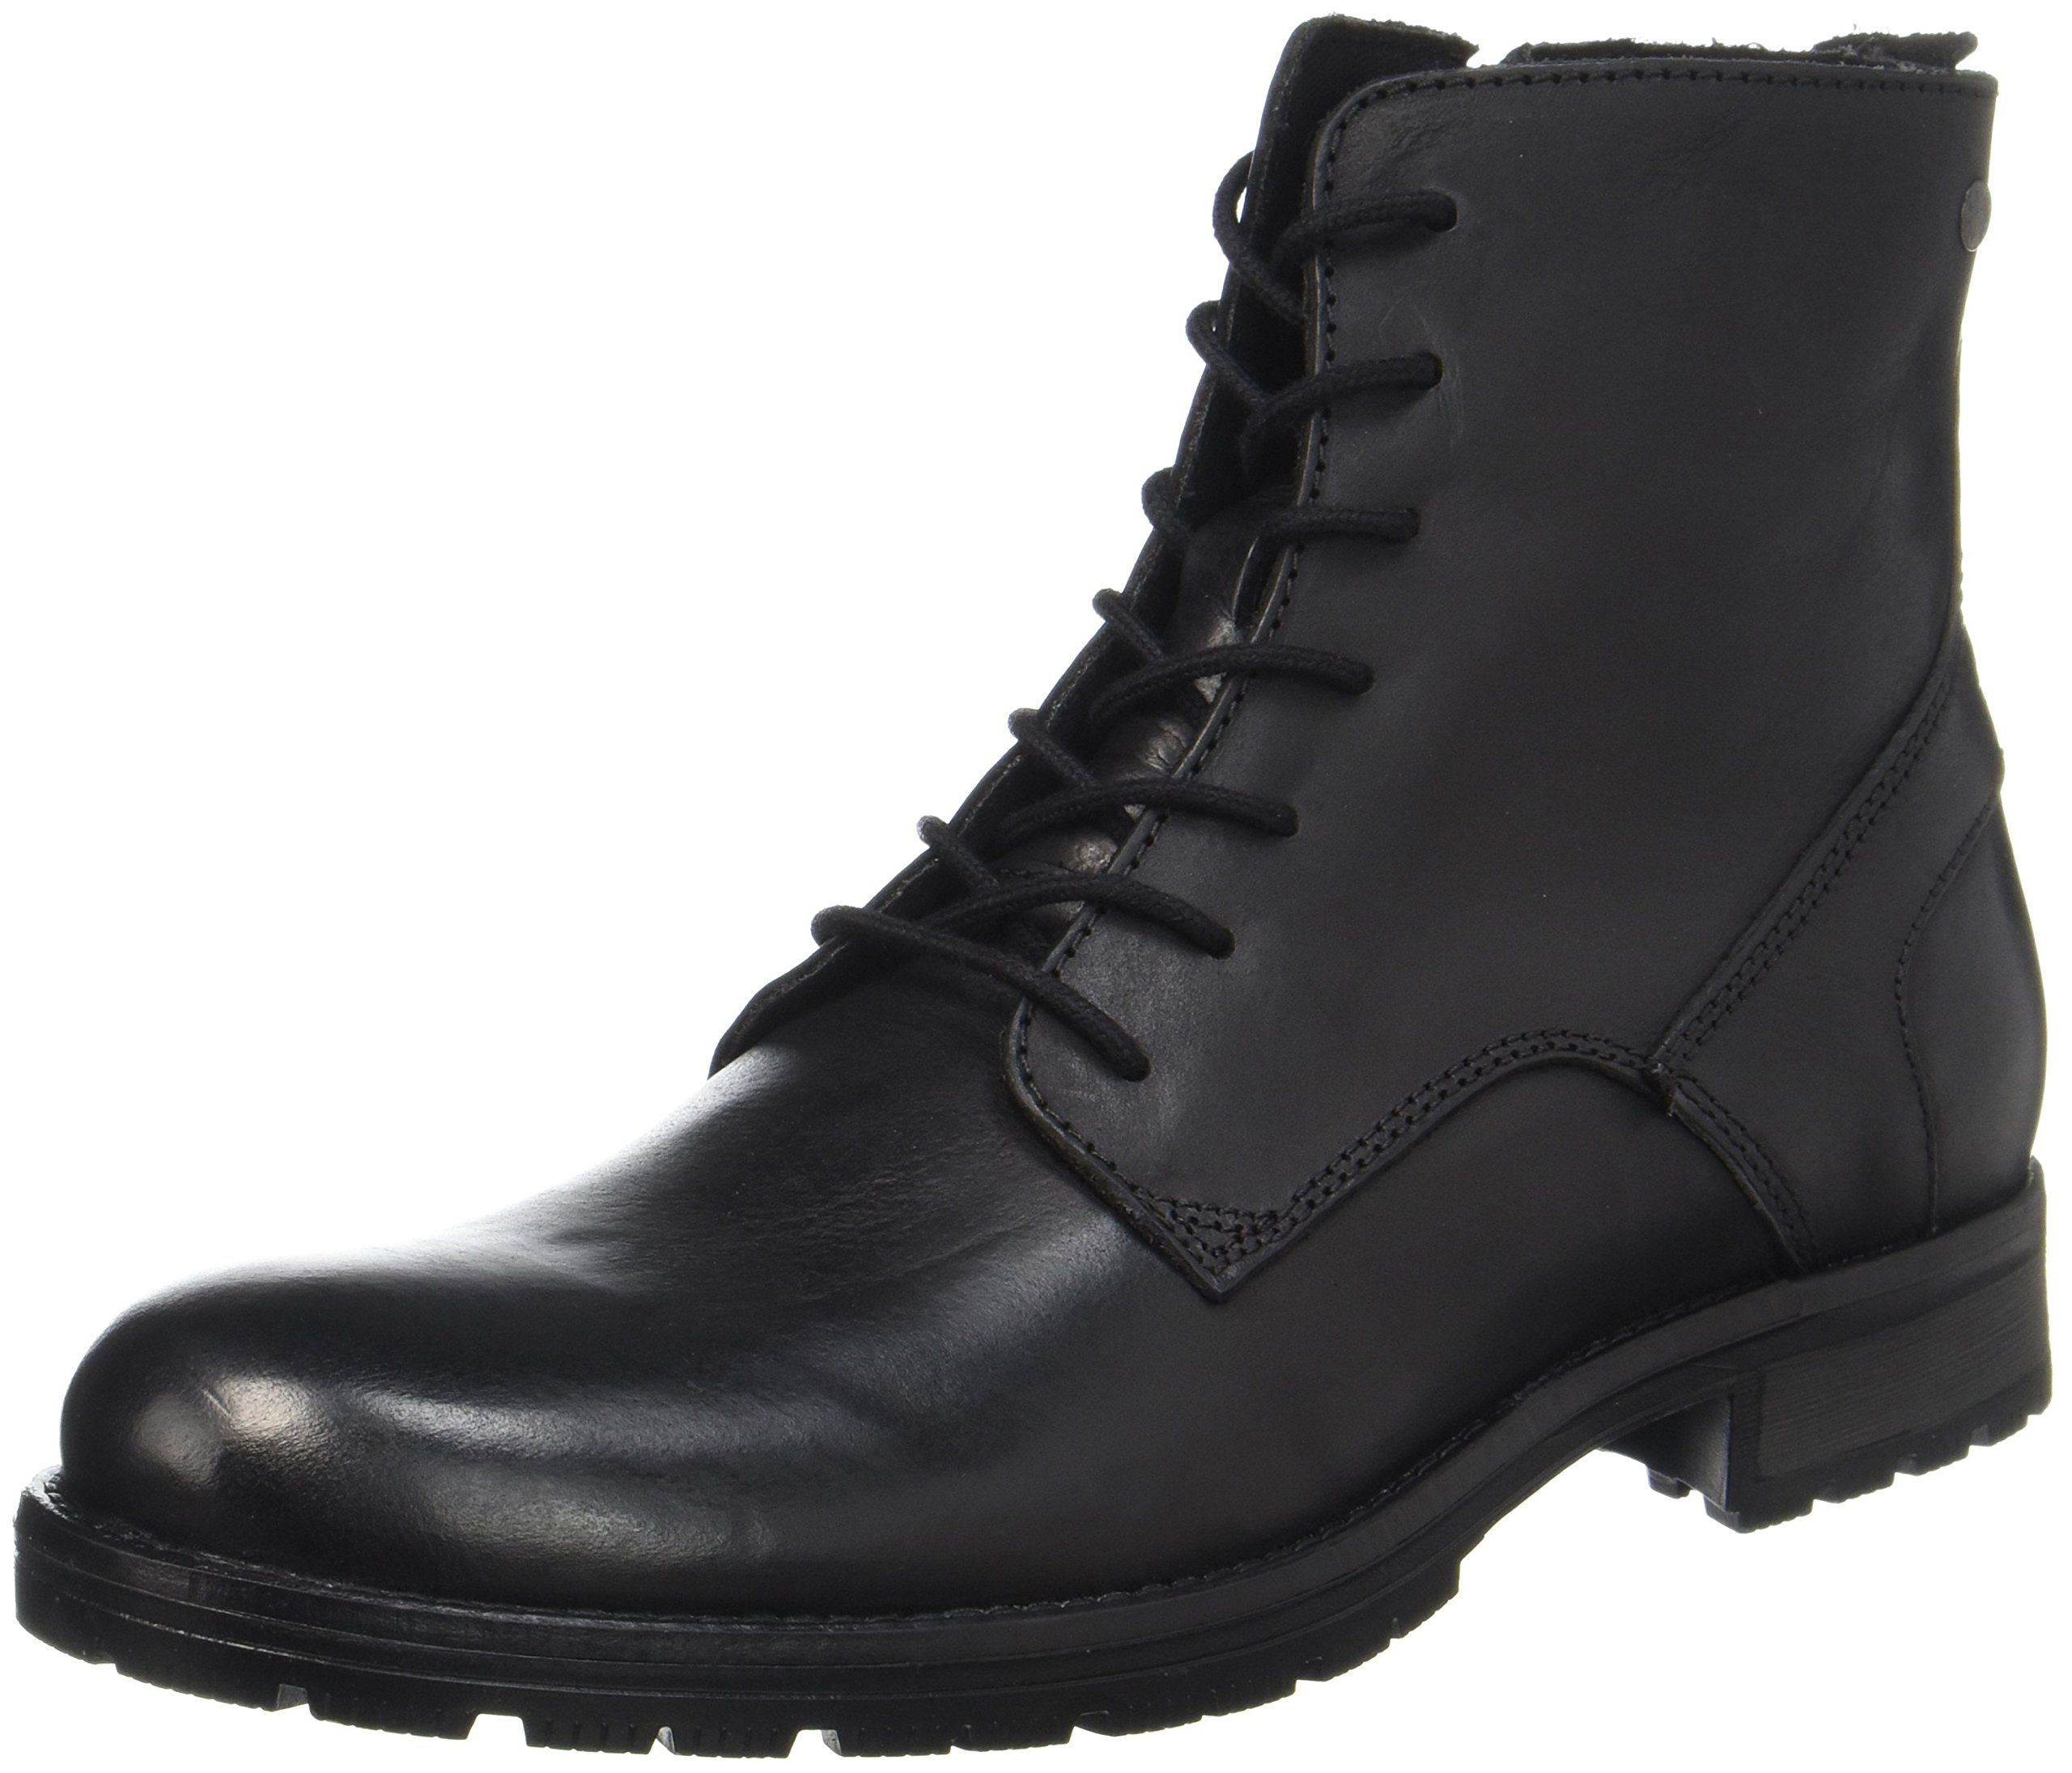 Jackamp; HommeNoir42 Eu Jones Classiques Leather Jfworca BlackBottes PwTukZilOX